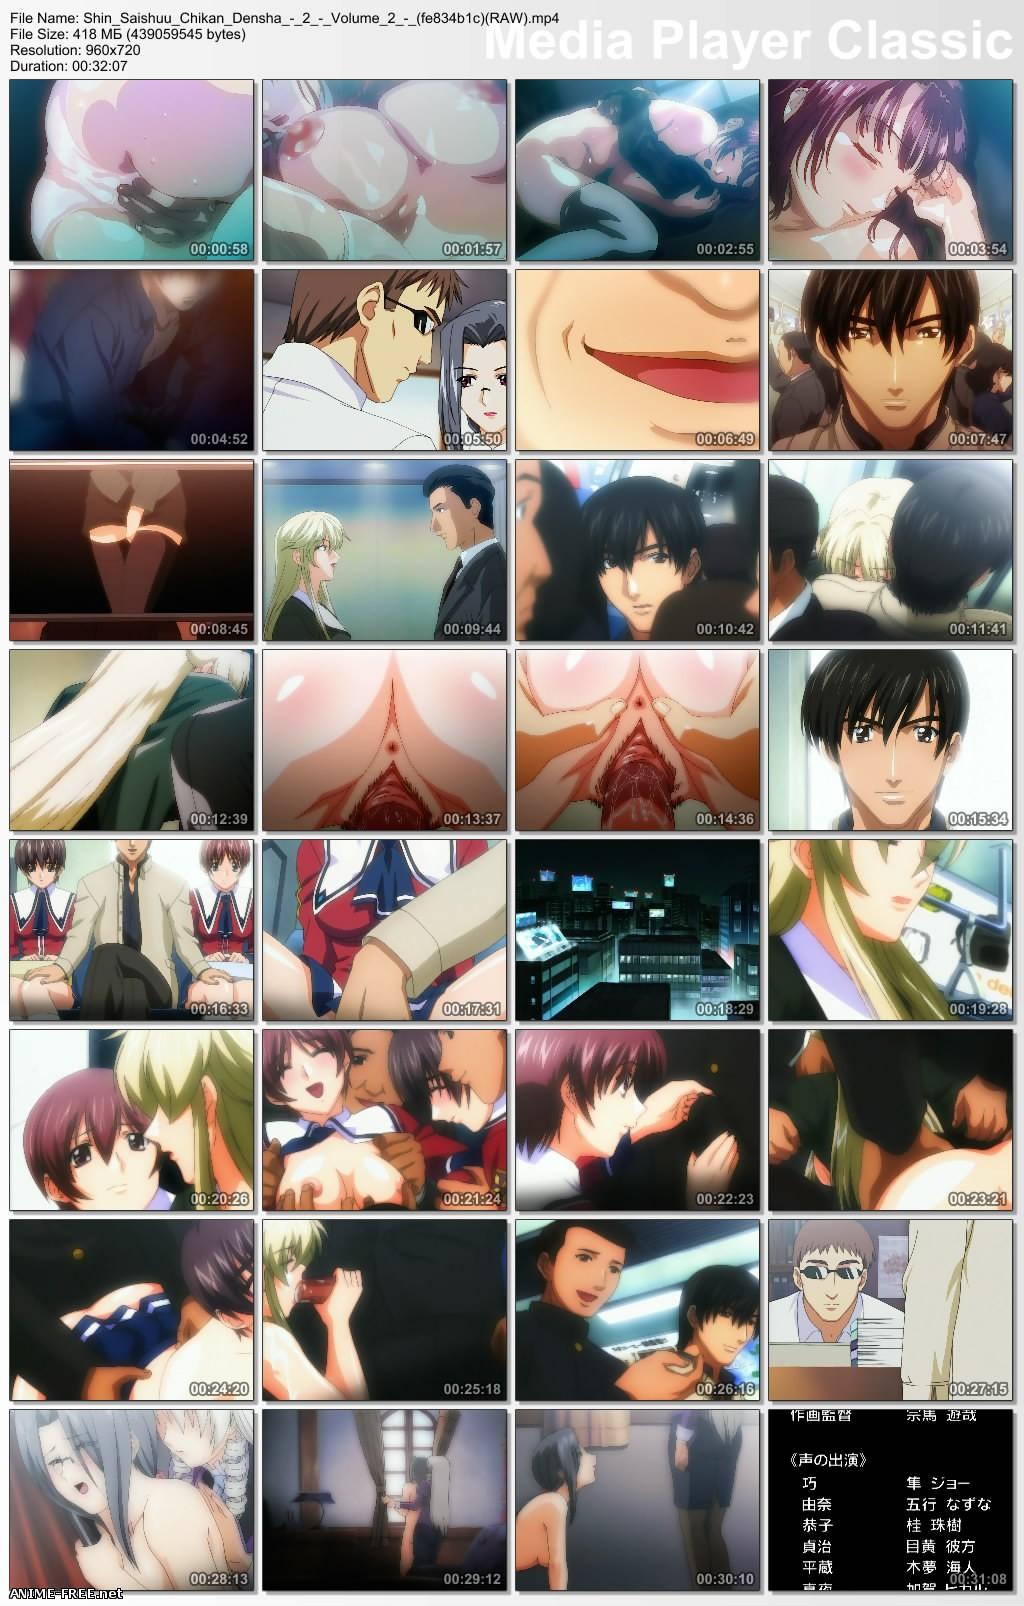 Midnight Sleazy Train 2 / Shin Saishuu Chikan Densha / Новые страсти в ночной электричке [3 из 3] [720p] [JAP,RUS] Anime Hentai